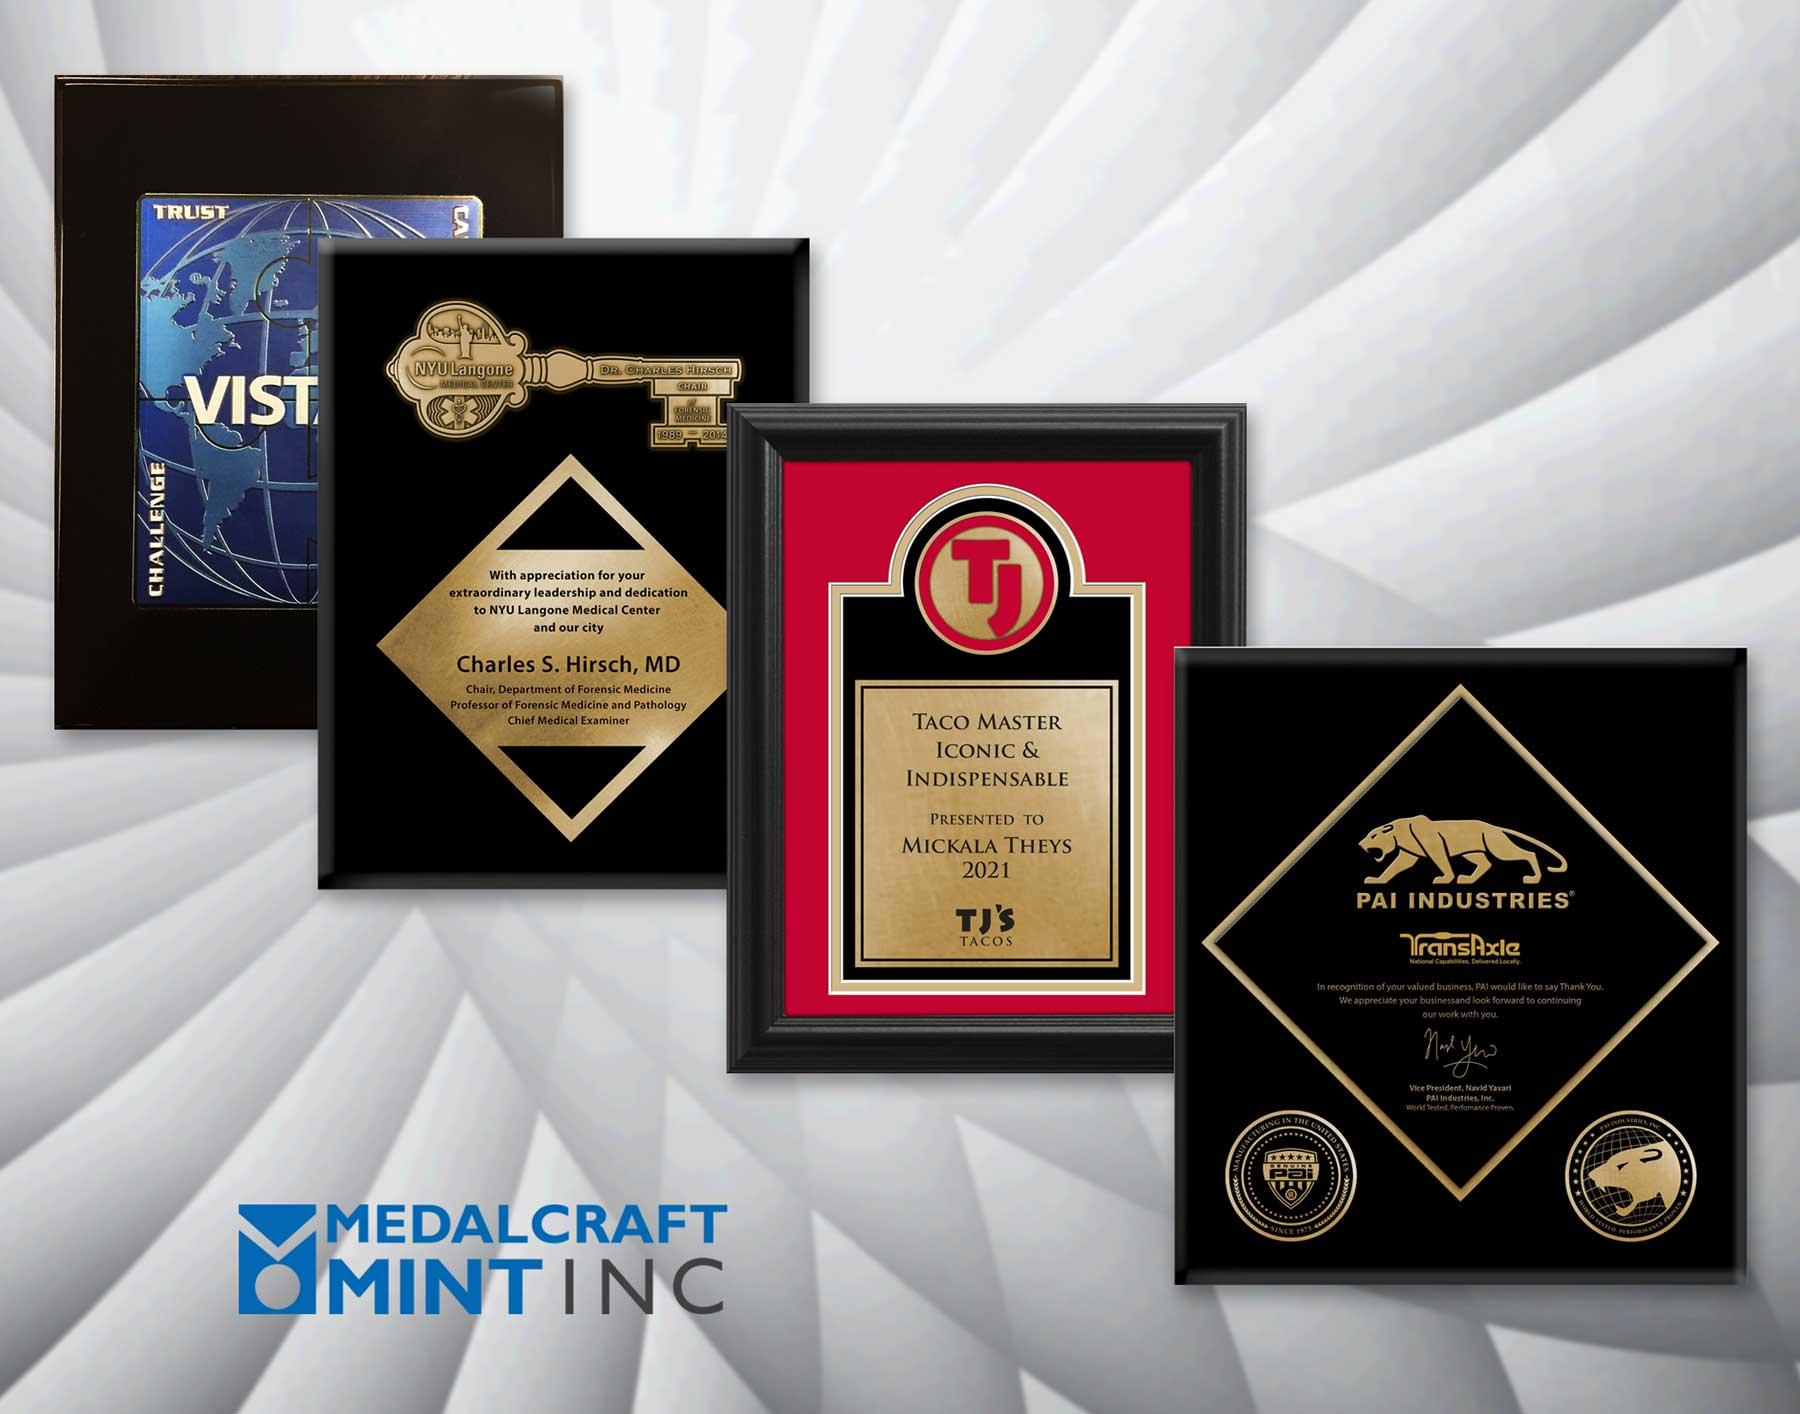 Medalcraft Mint award medallion plaques